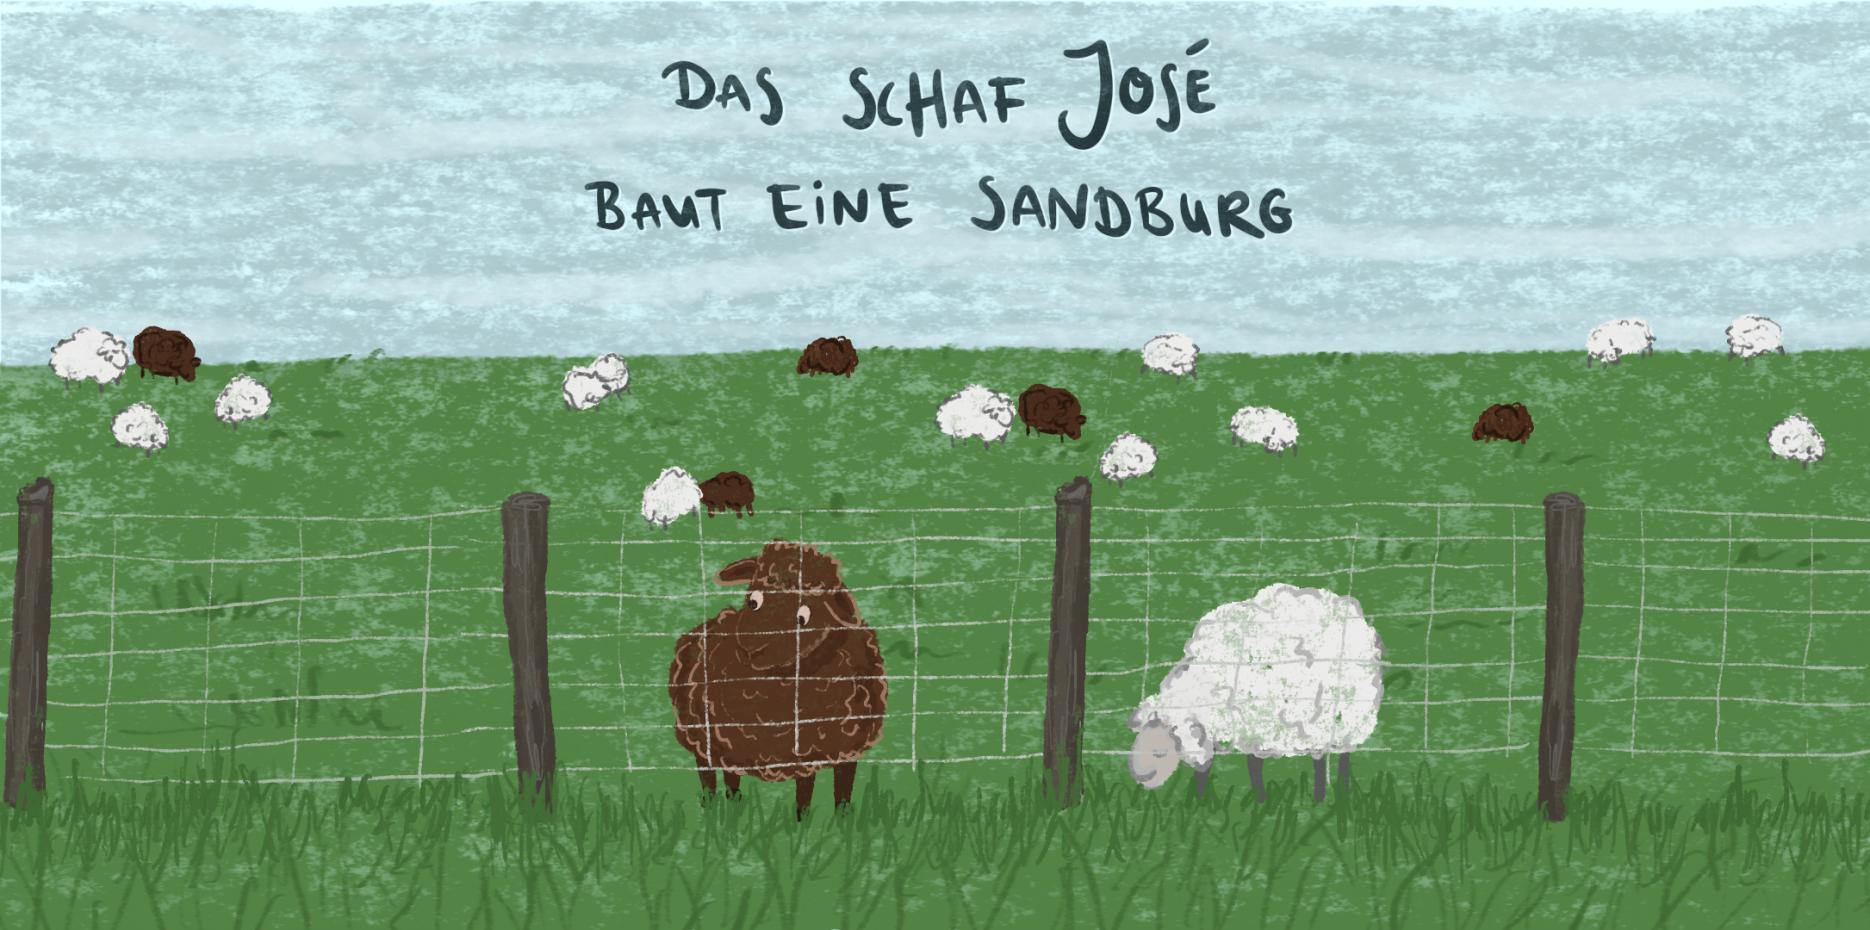 Illustration: José schaut durch den Zaun